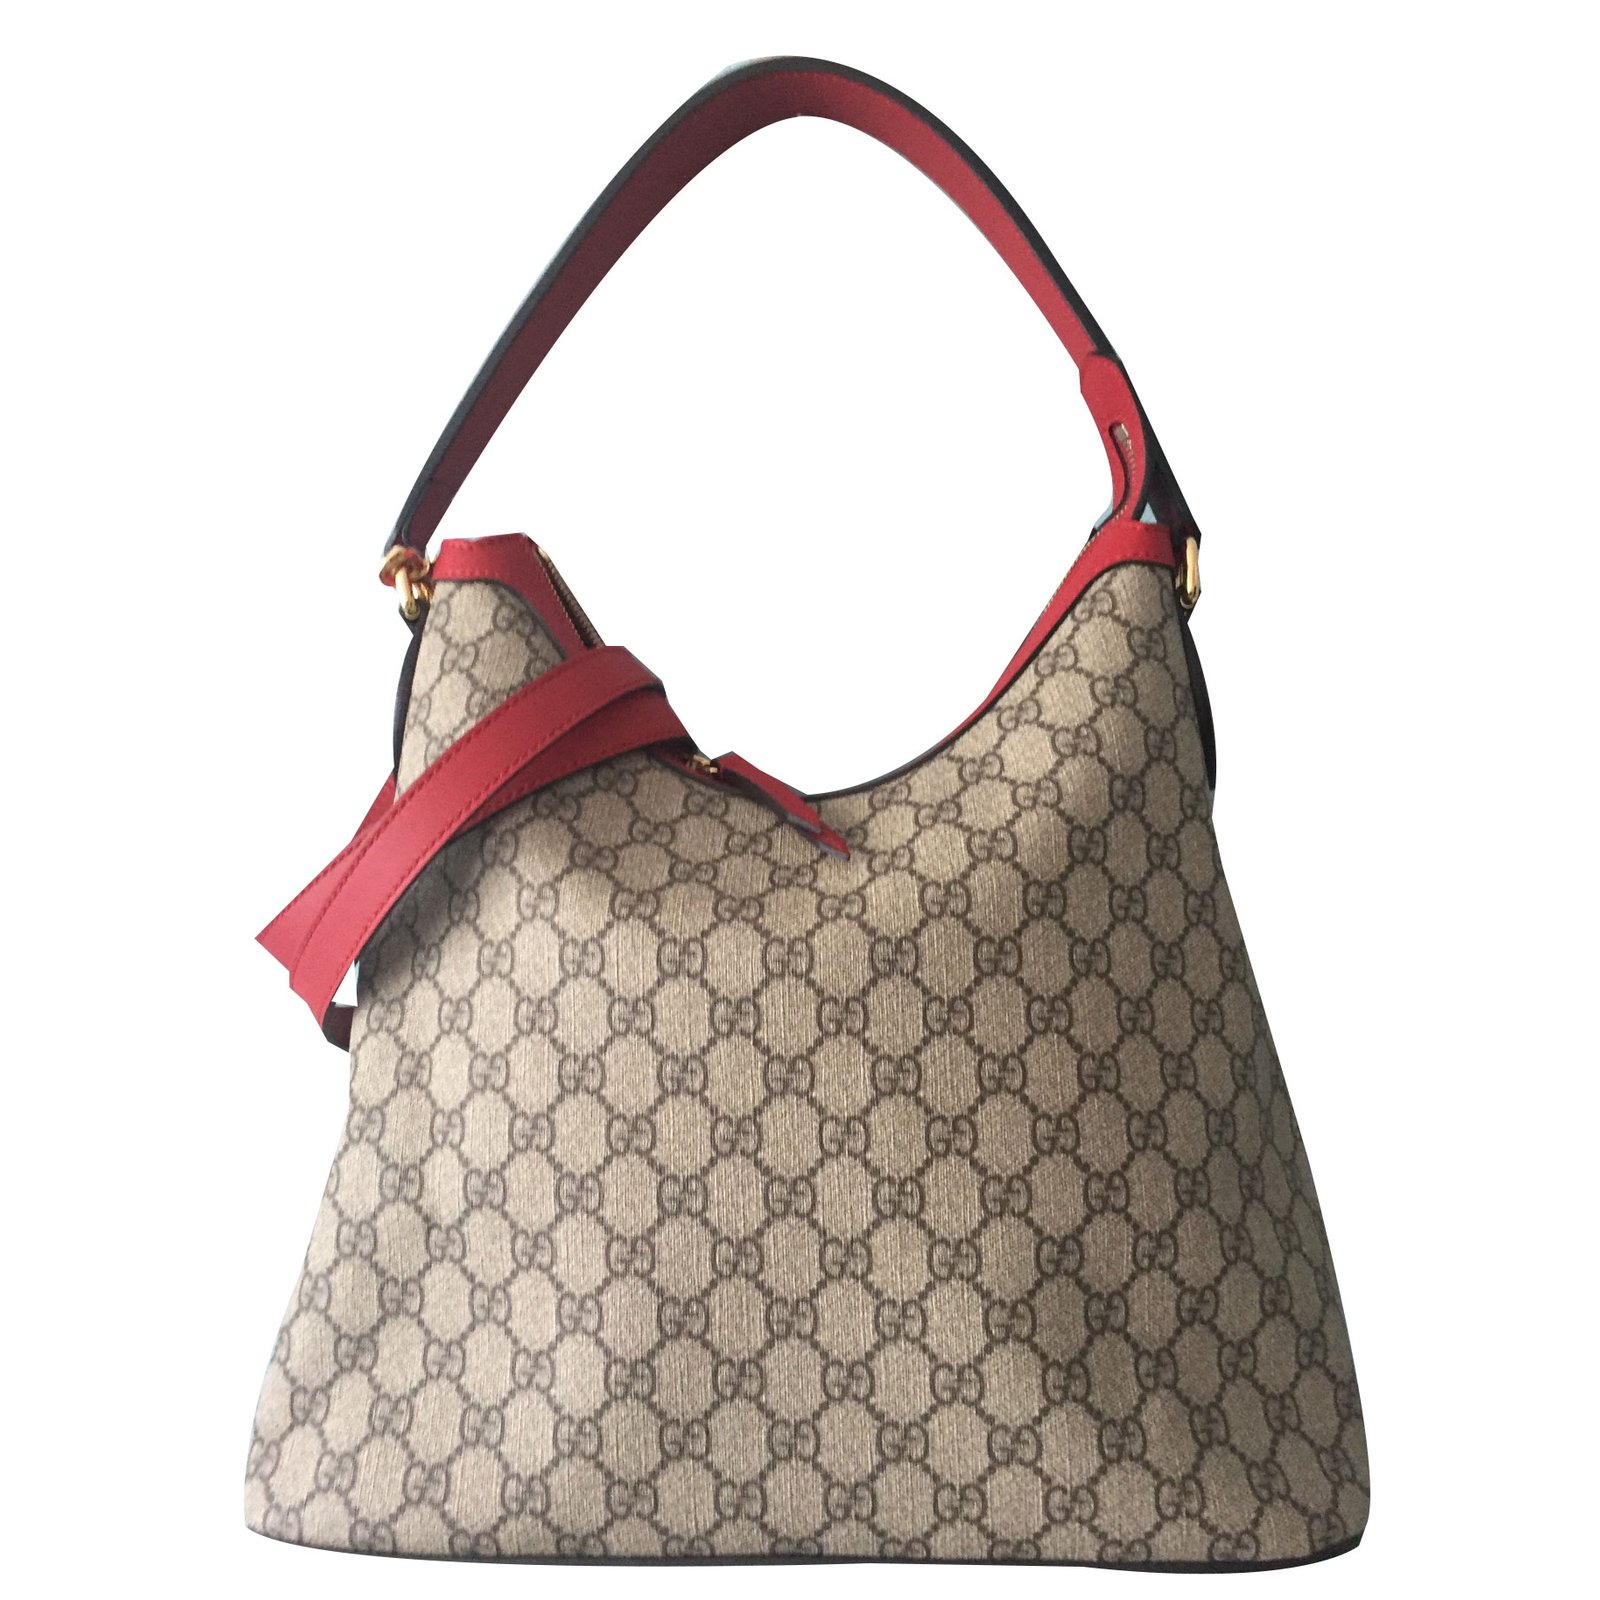 daeb4b41626c Gucci Supreme Hobo Totes Leather Beige ref.71226 - Joli Closet